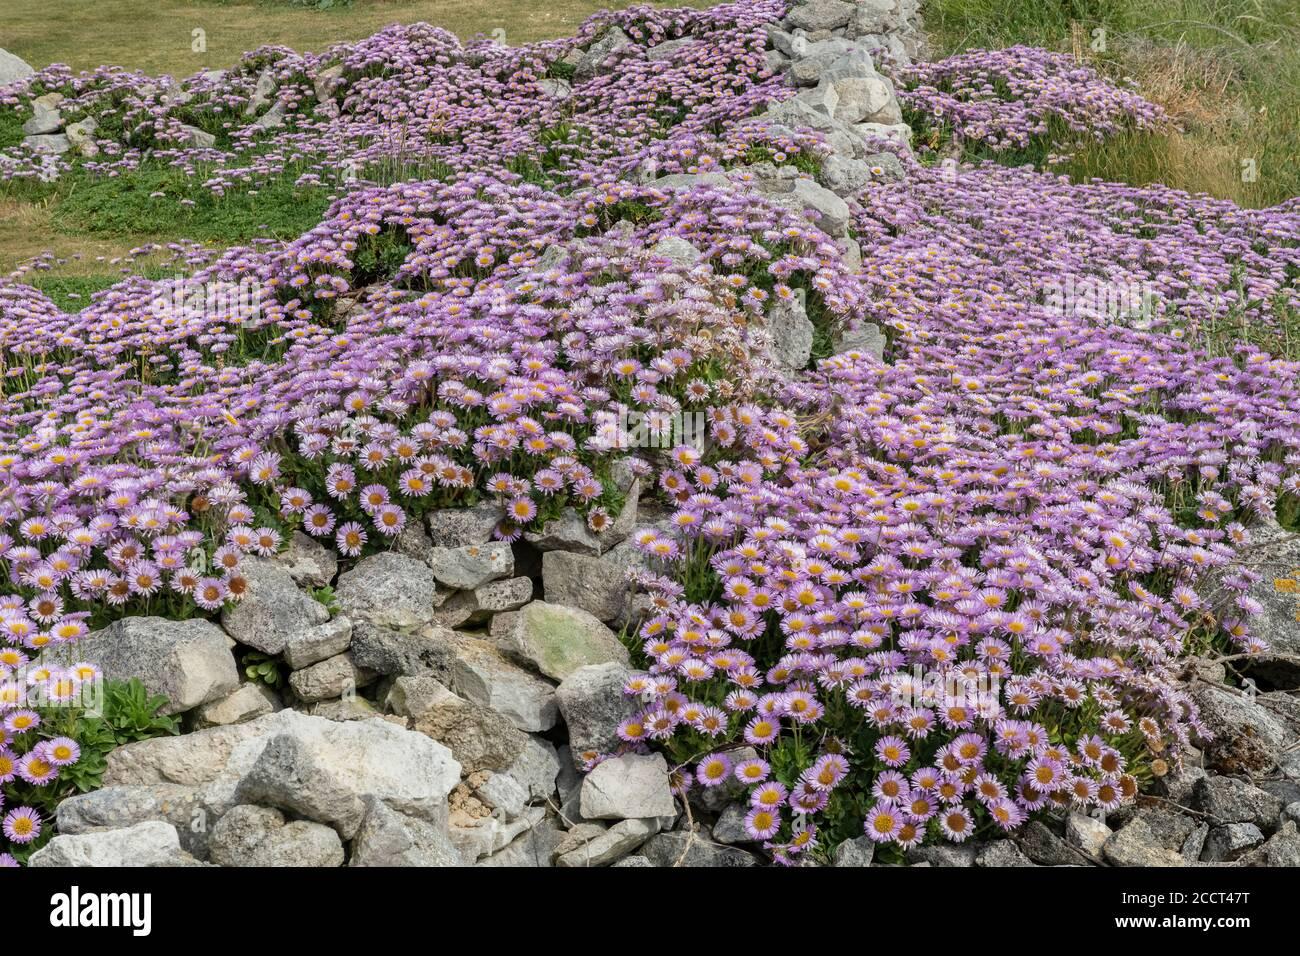 Seaside daisy, Erigeron glaucus, naturalised en masse on the limestone coast of Portland, Dorset. Stock Photo